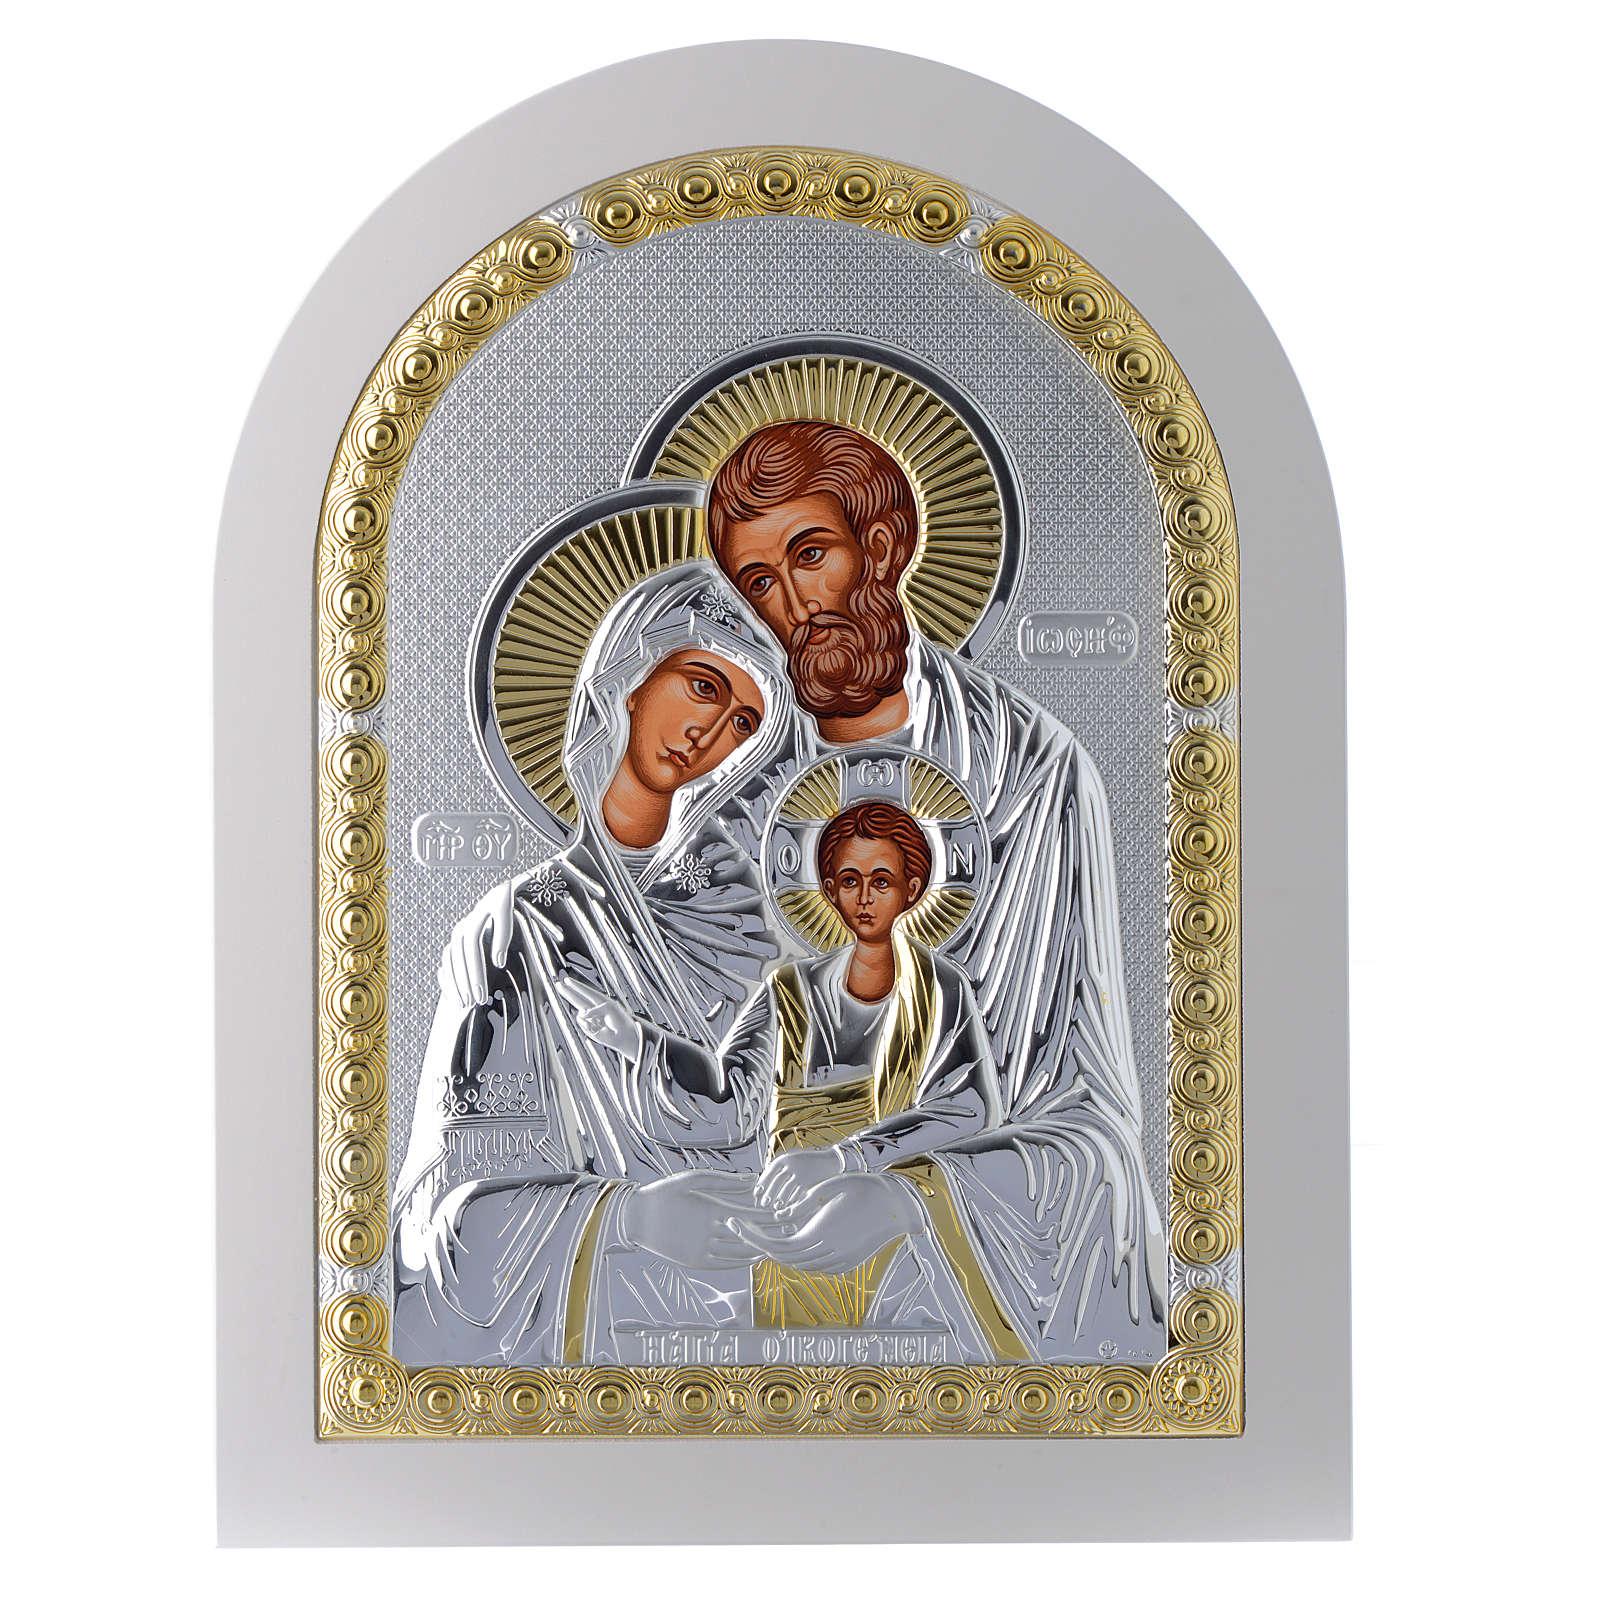 Icona Sacra Famiglia 30x25 cm argento 925 finiture dorate 4